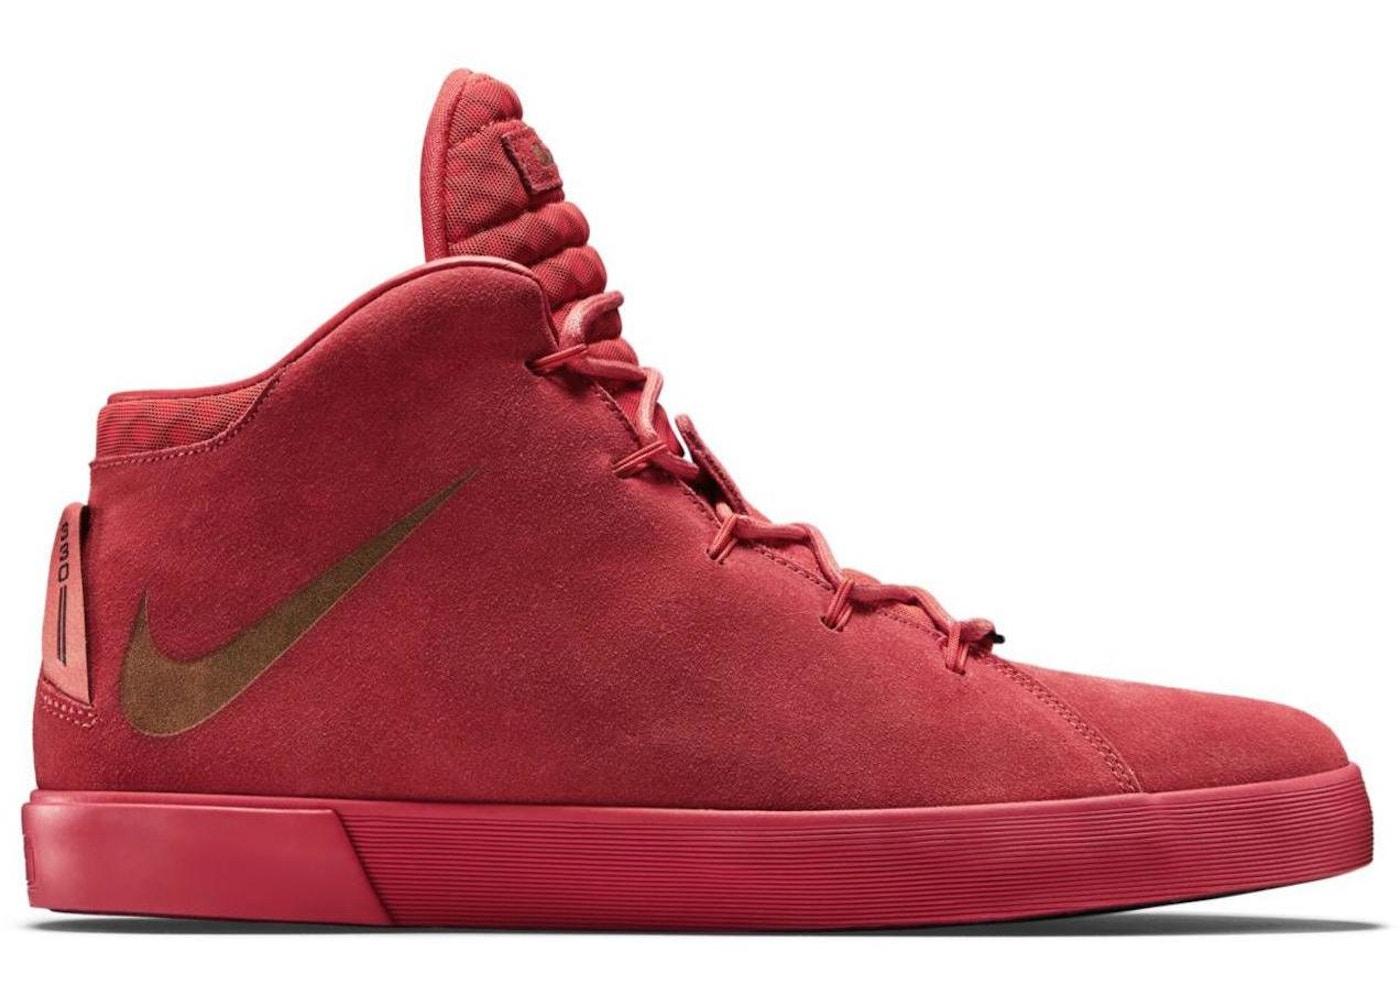 new style 9f868 5682c Nike LeBron 12 Shoes - Price Premium